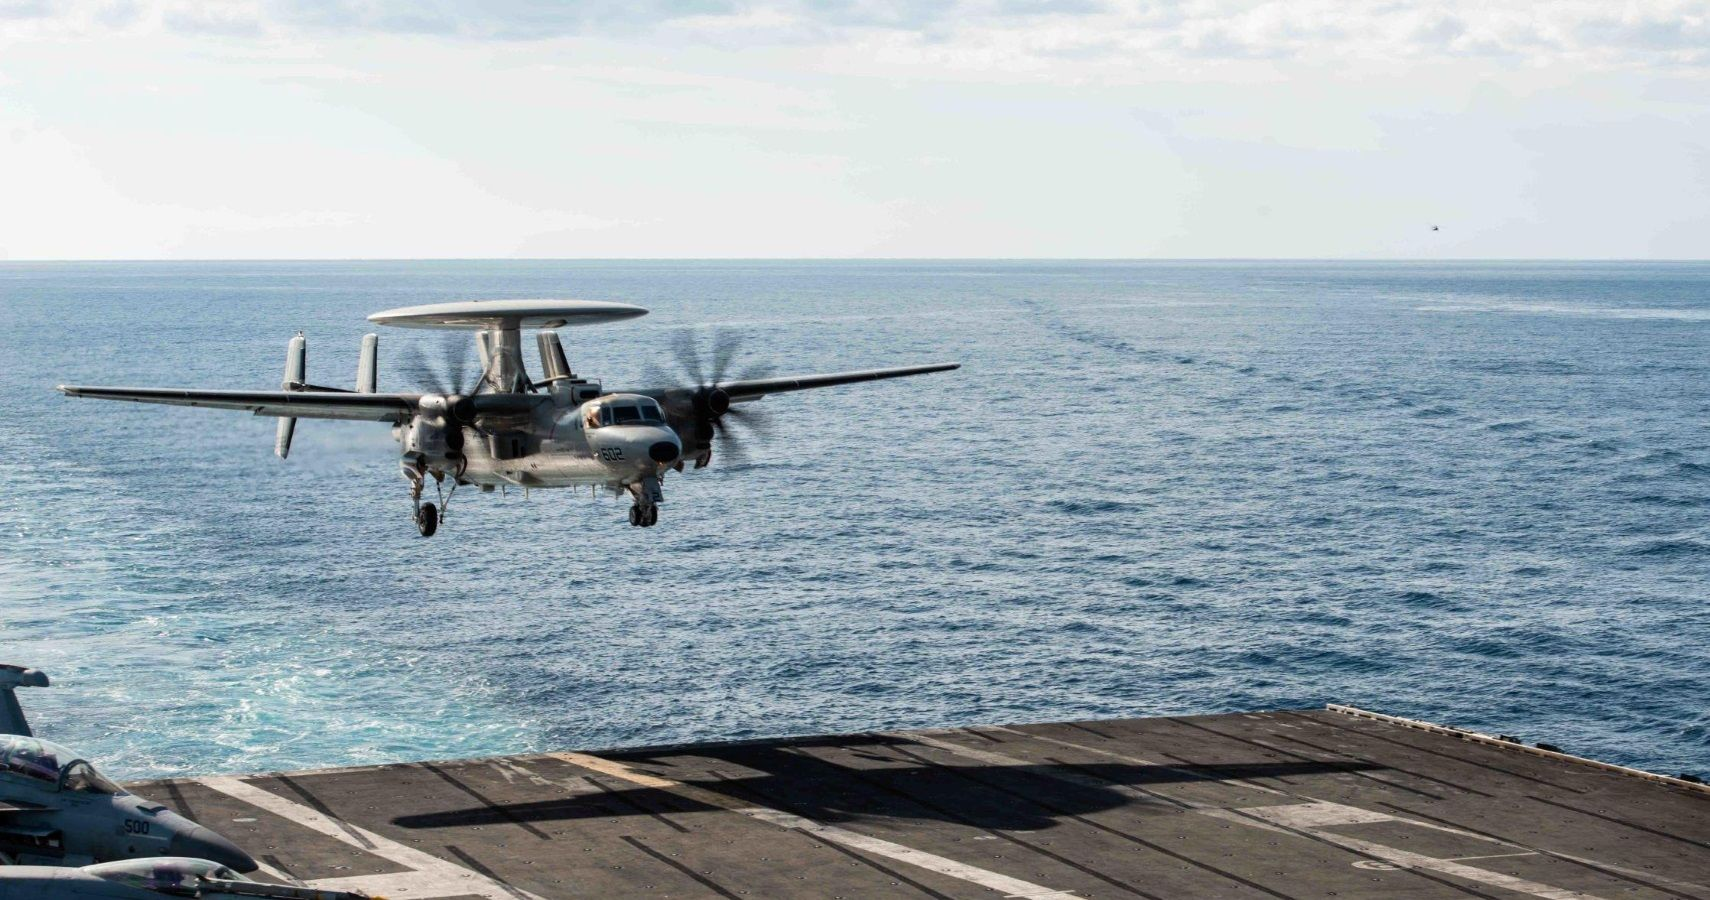 France Signs $2B Deal For Northrop Grumman's E-2D Hawkeye Aircraft